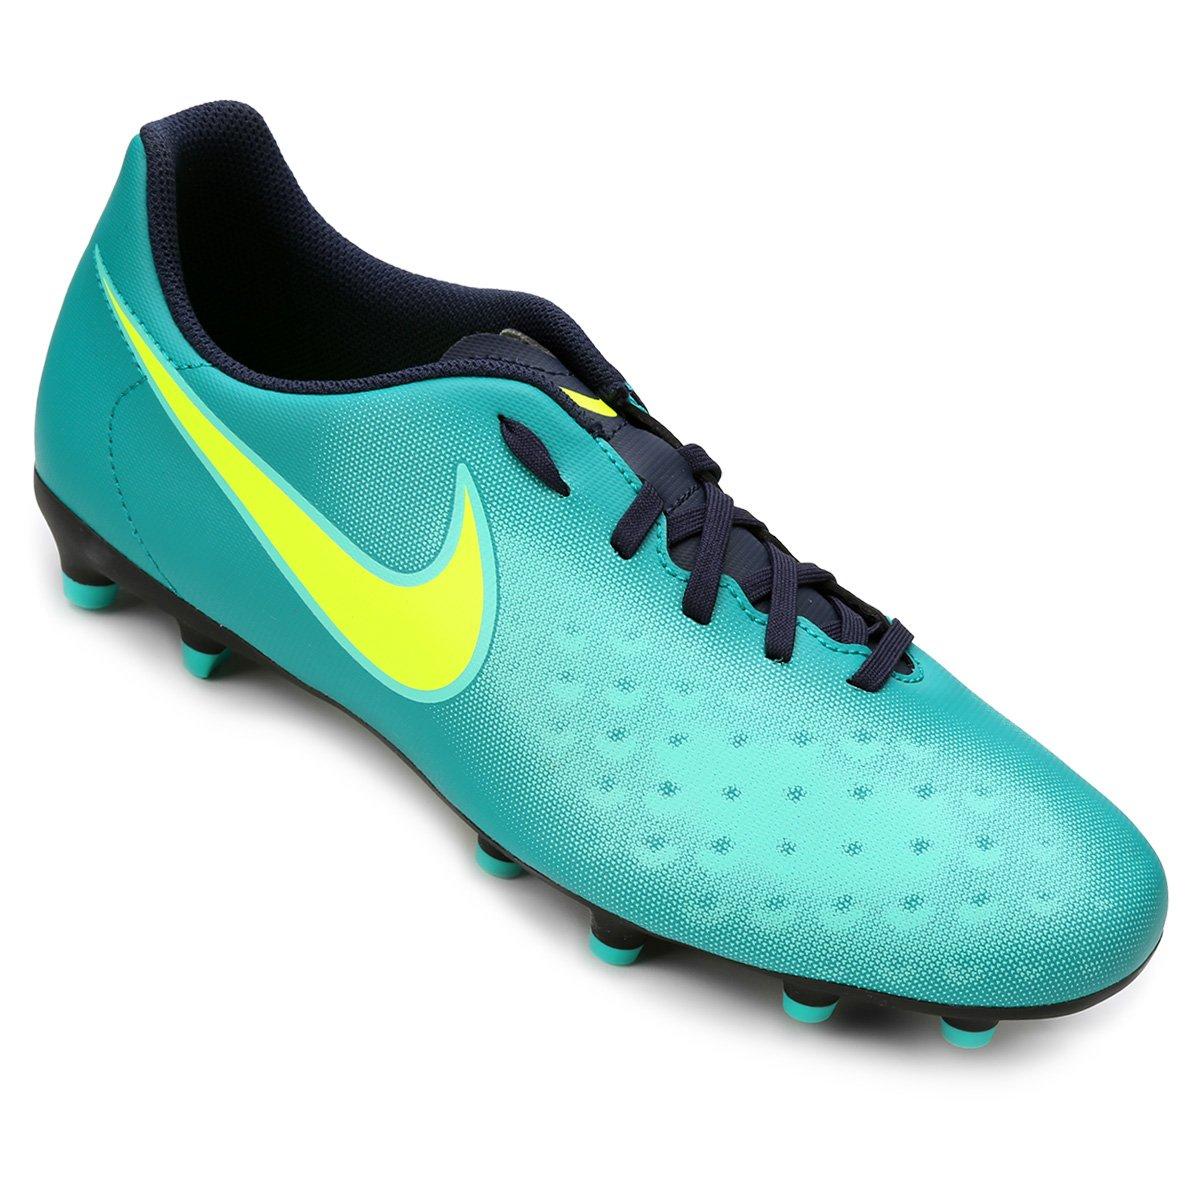 67b3c12857 Chuteira Campo Nike Magista Ola II FG - Compre Agora